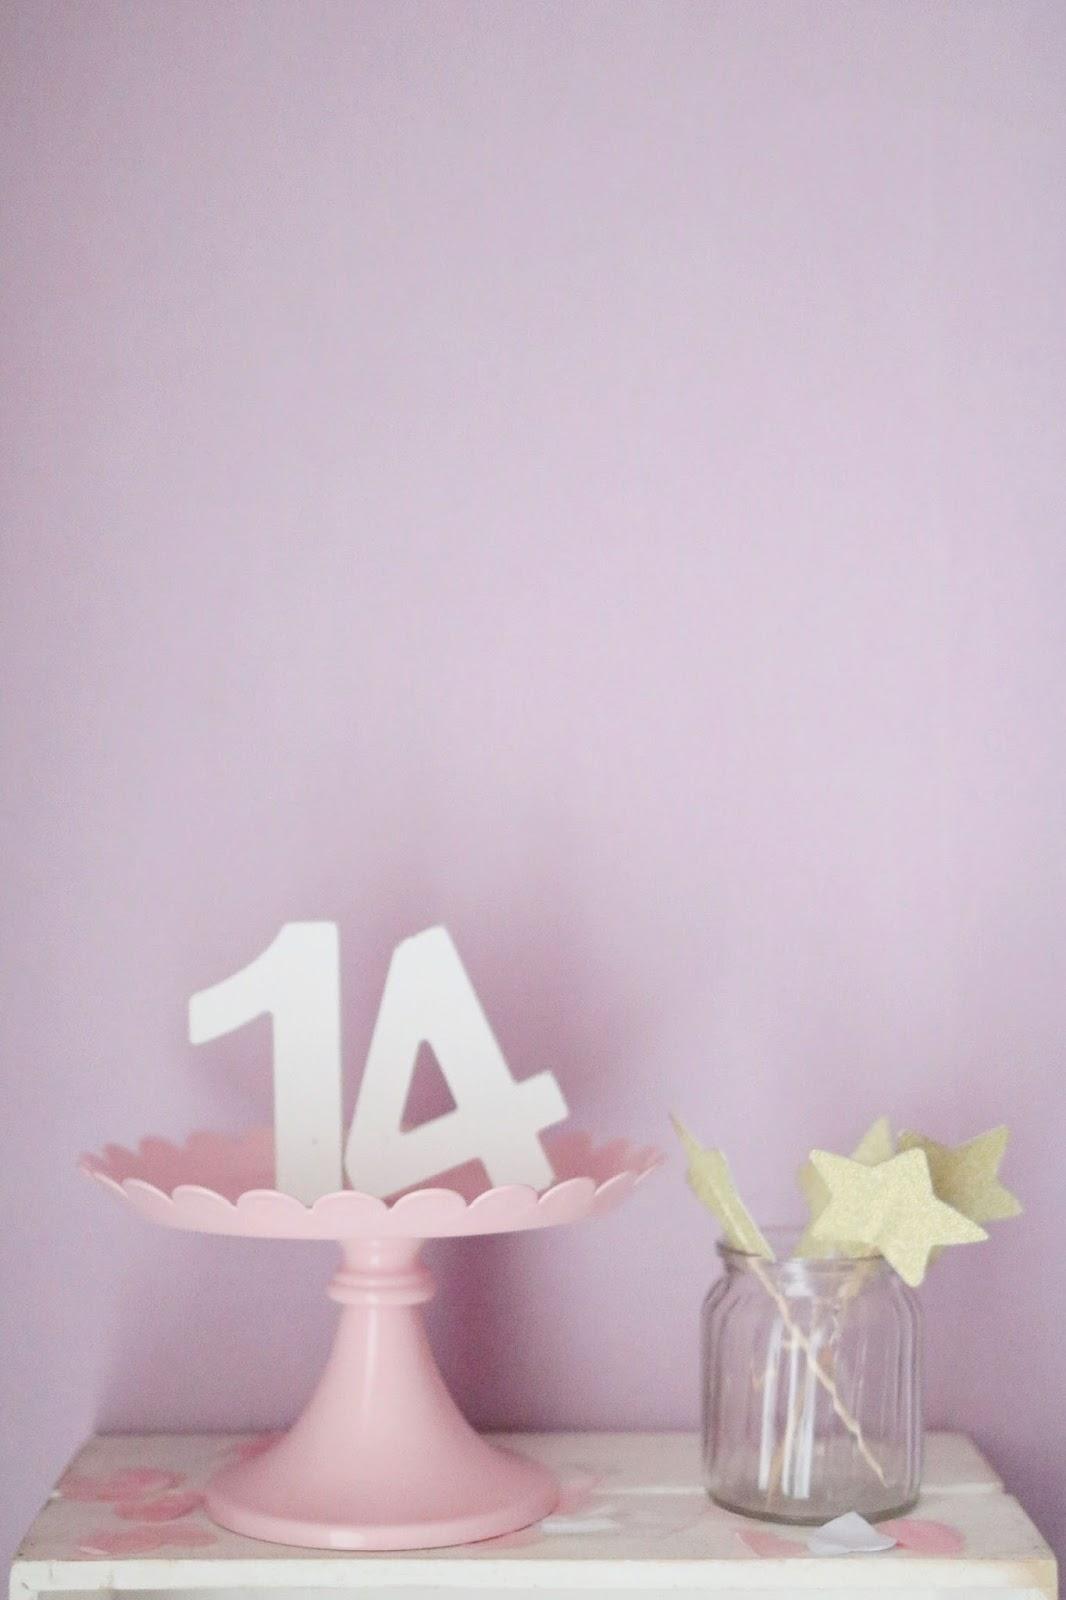 rosemademoiselle-rose-mademoiselle-concours-calendrier-de-l'avent-saint-valentin